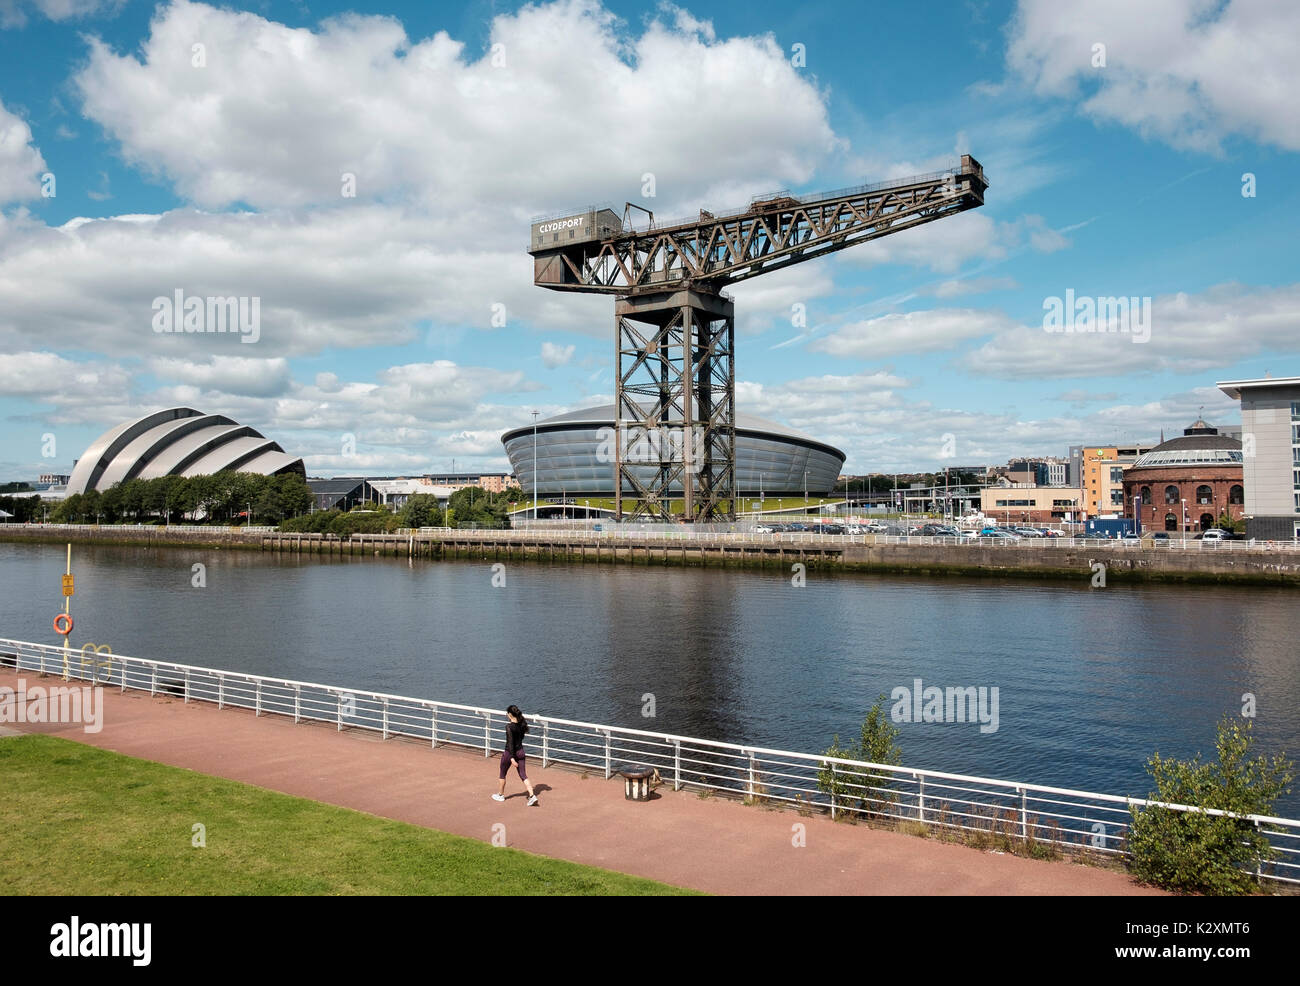 Hotels Near Glasgow Hydro Arena